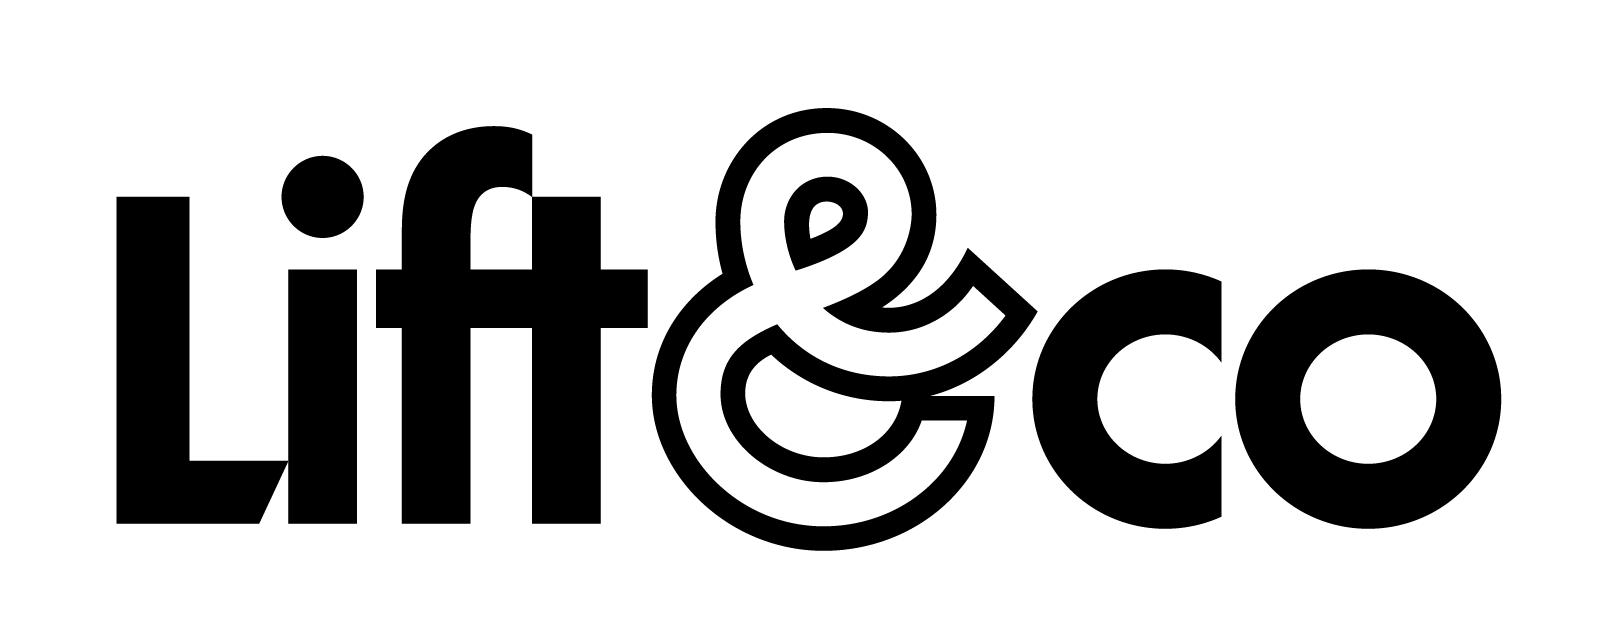 Lift & Co. Logo[94319] (1).png